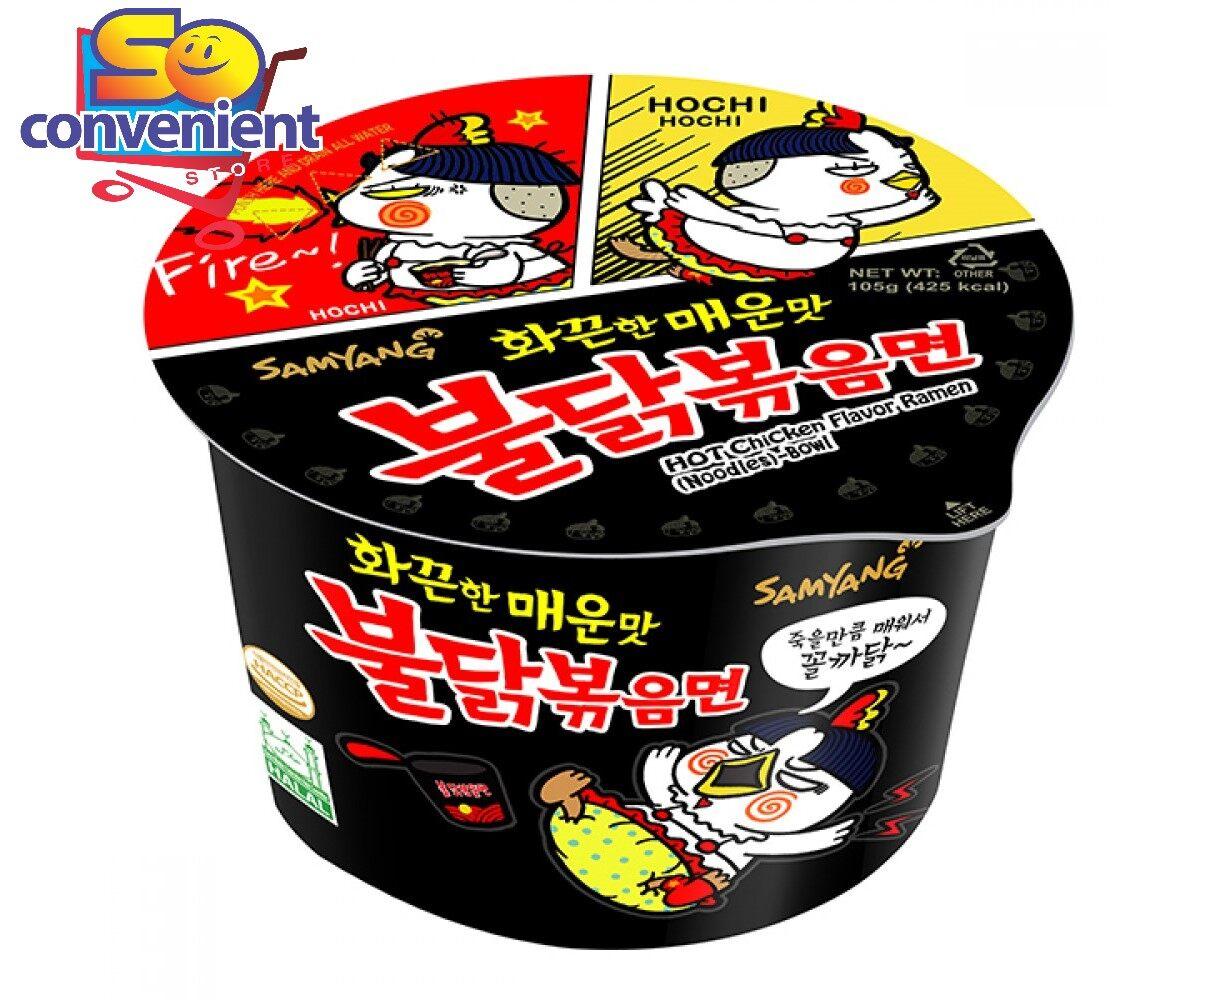 Samyang (Halal) Original Hot Chicken Big Bowl 105G